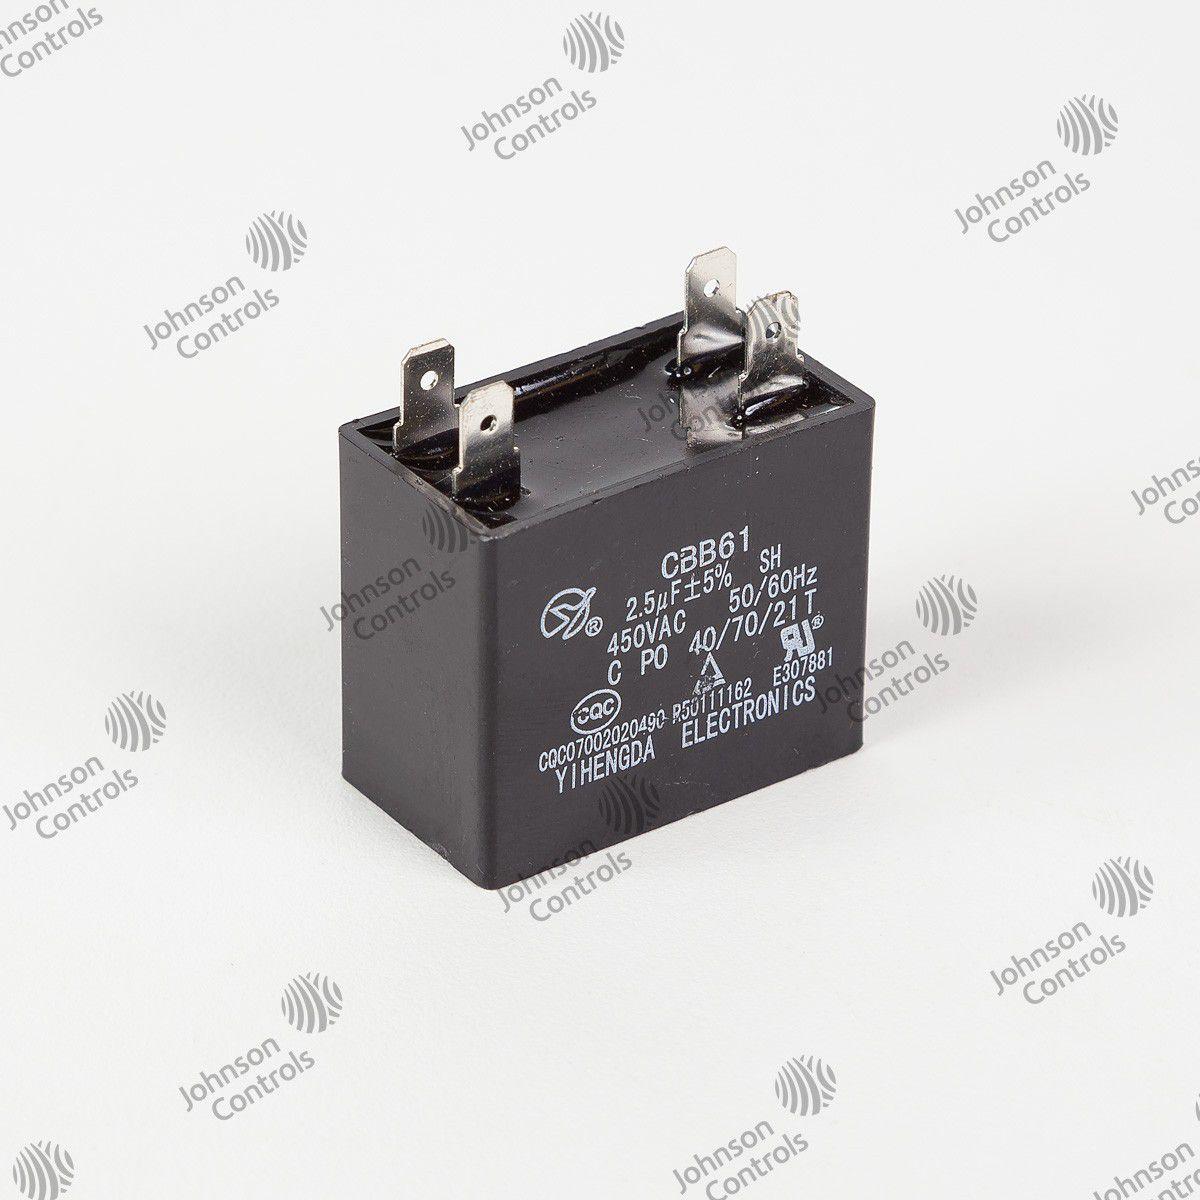 CAPACITOR DO MOTOR 2,5uF - C0901CKM006